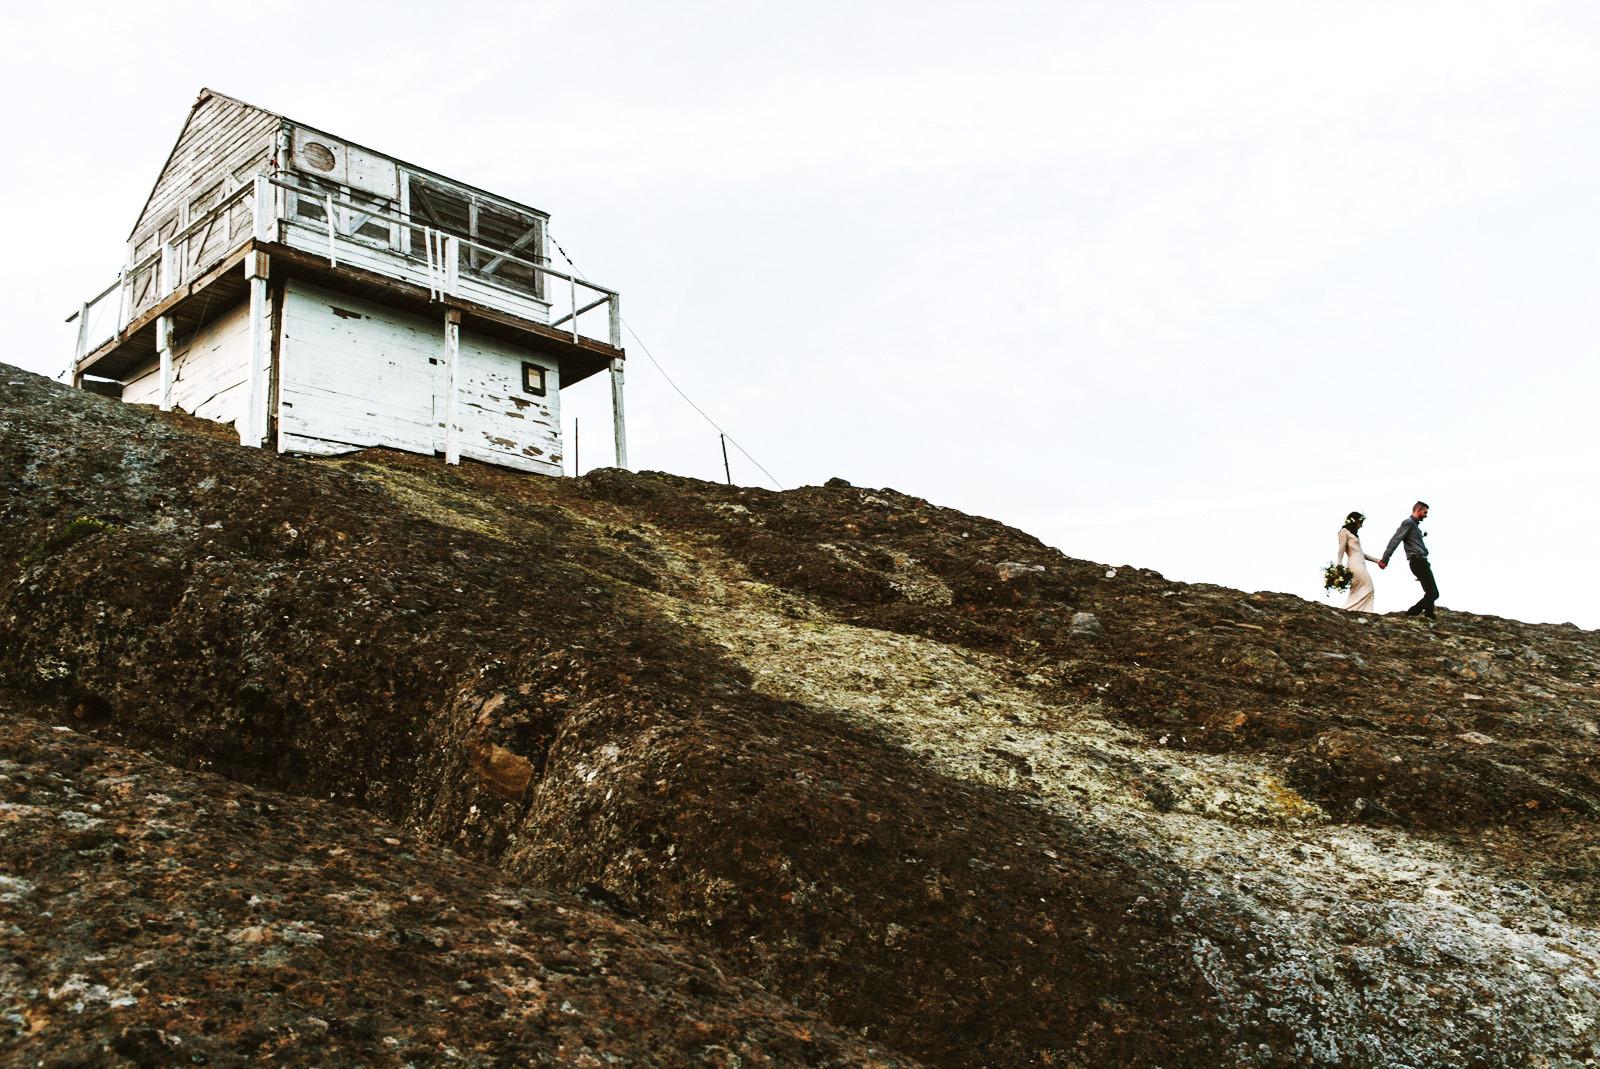 katelynnethan-blog-35 MOUNT RAINIER LOOKOUT ELOPEMENT